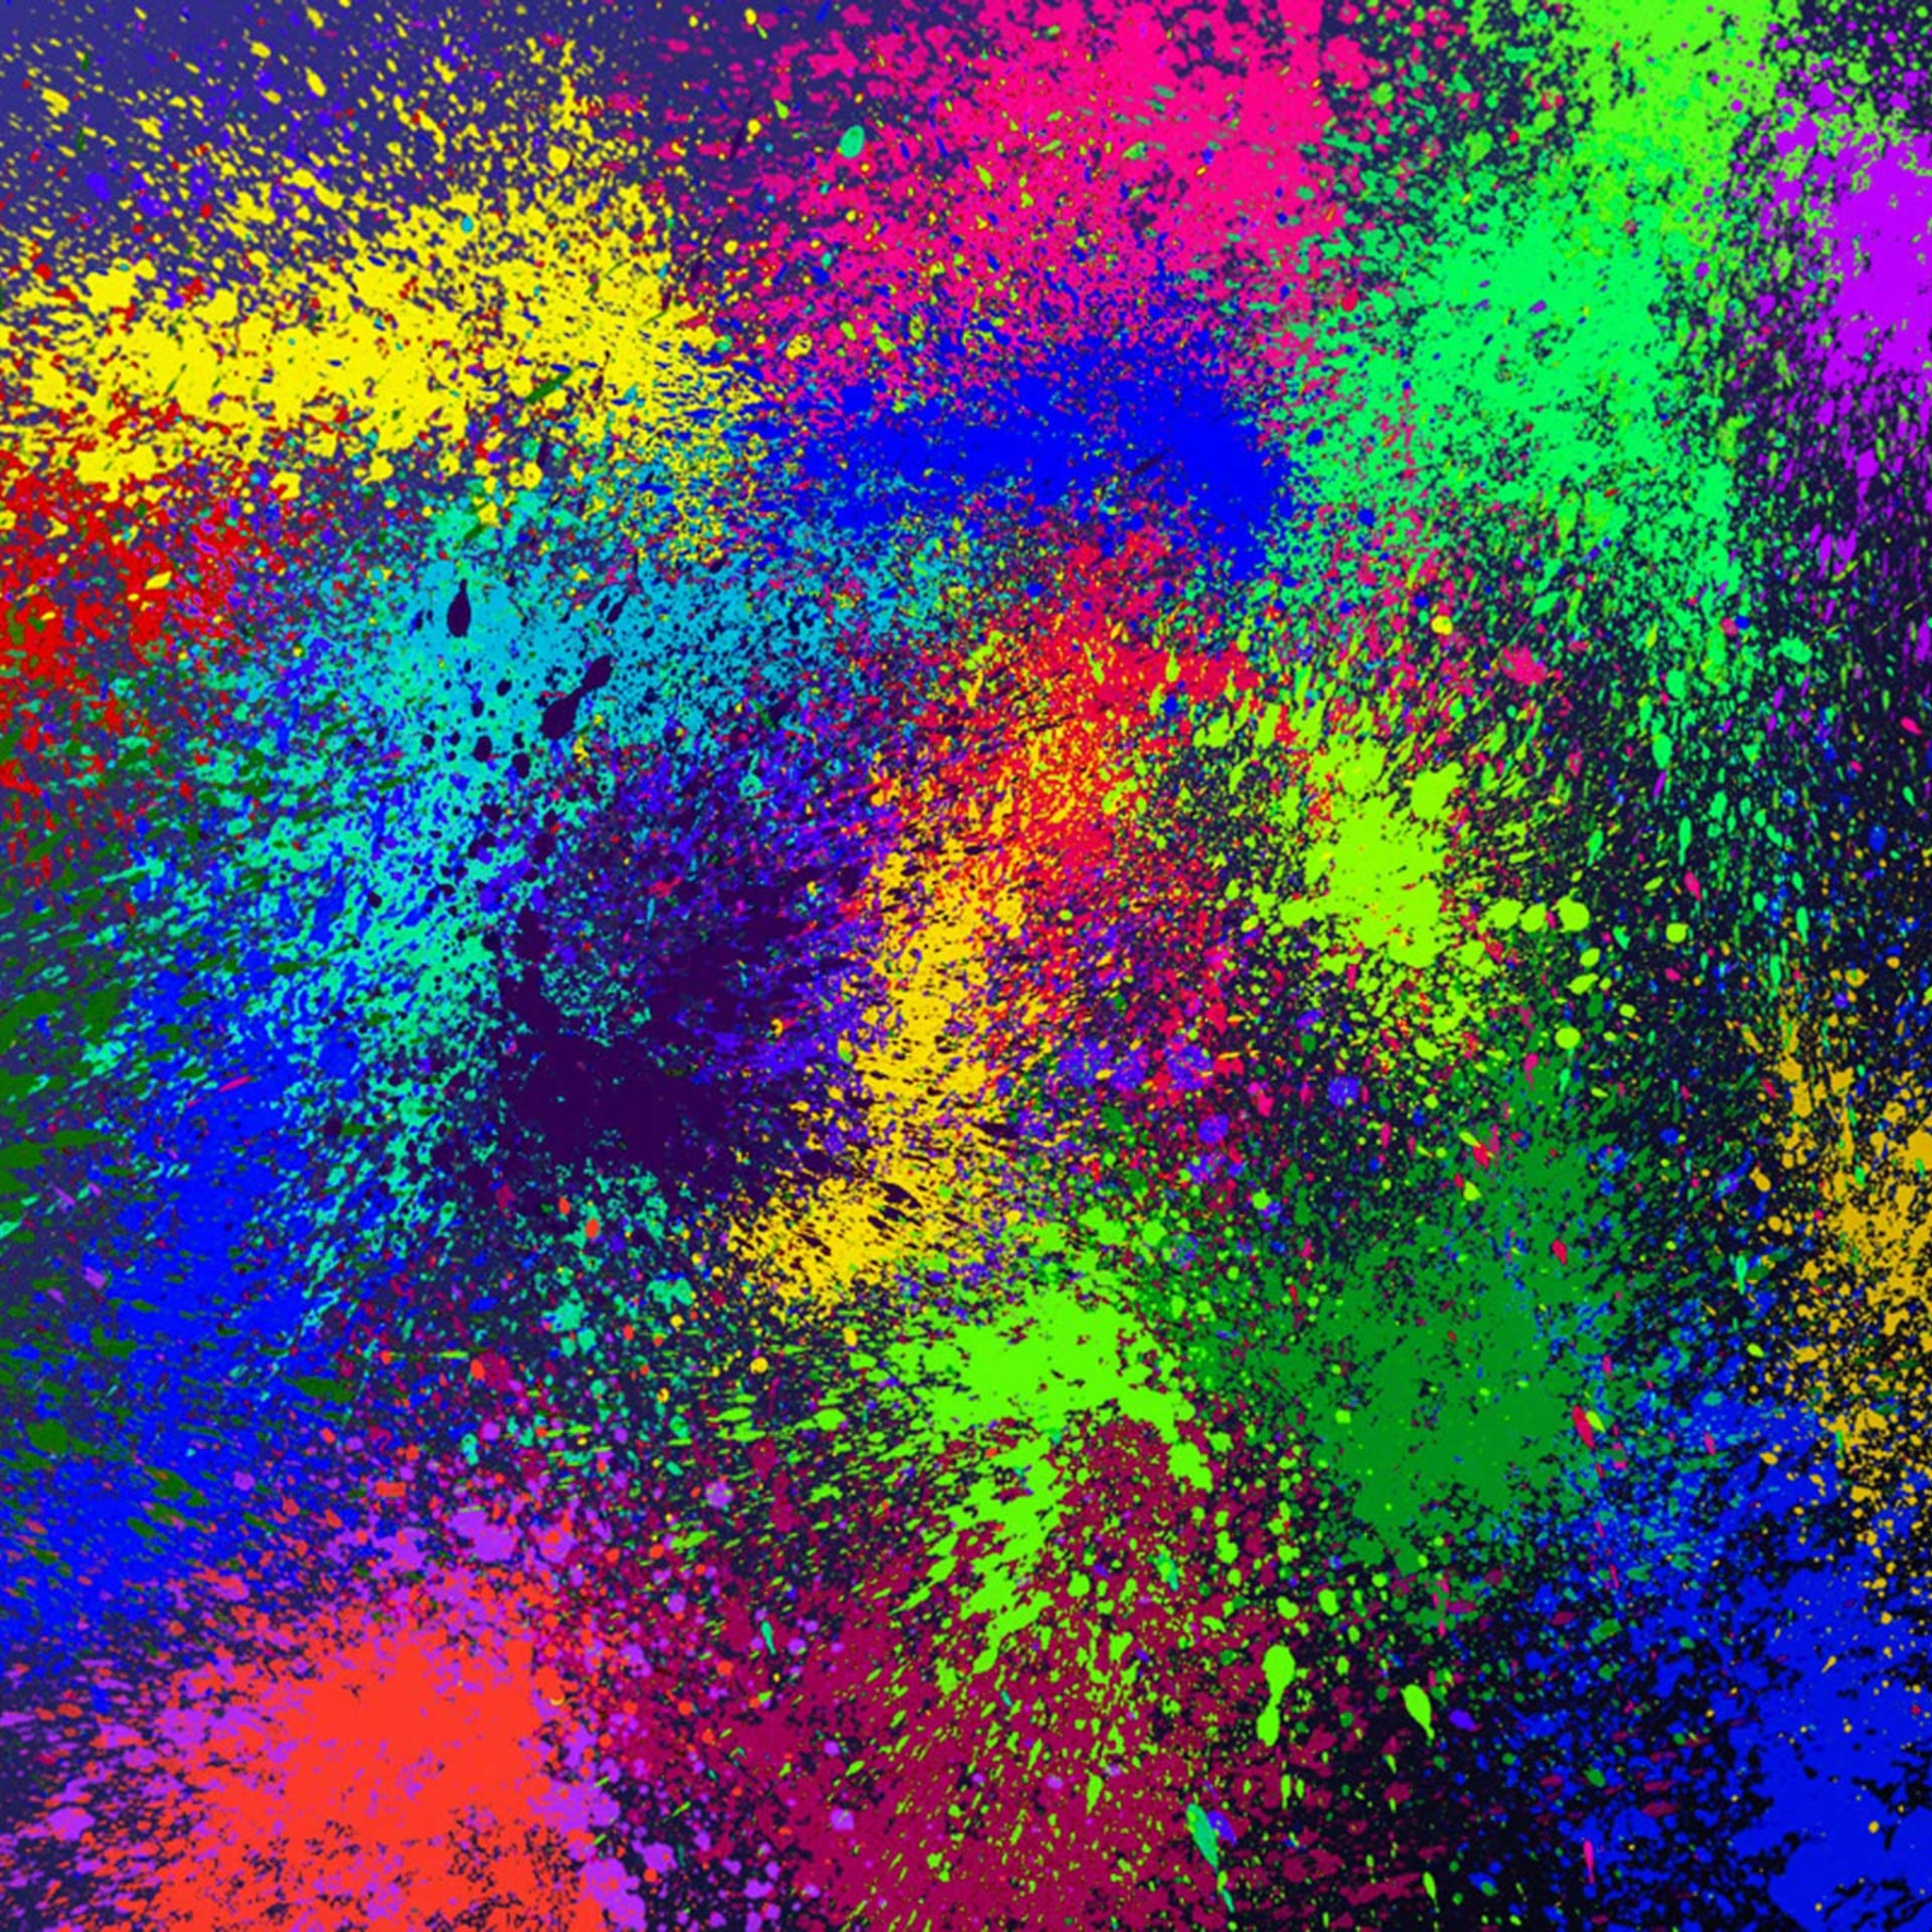 Free Download My Ipad Wallpaper Hd Live Colors 20 2048x2048 Apps